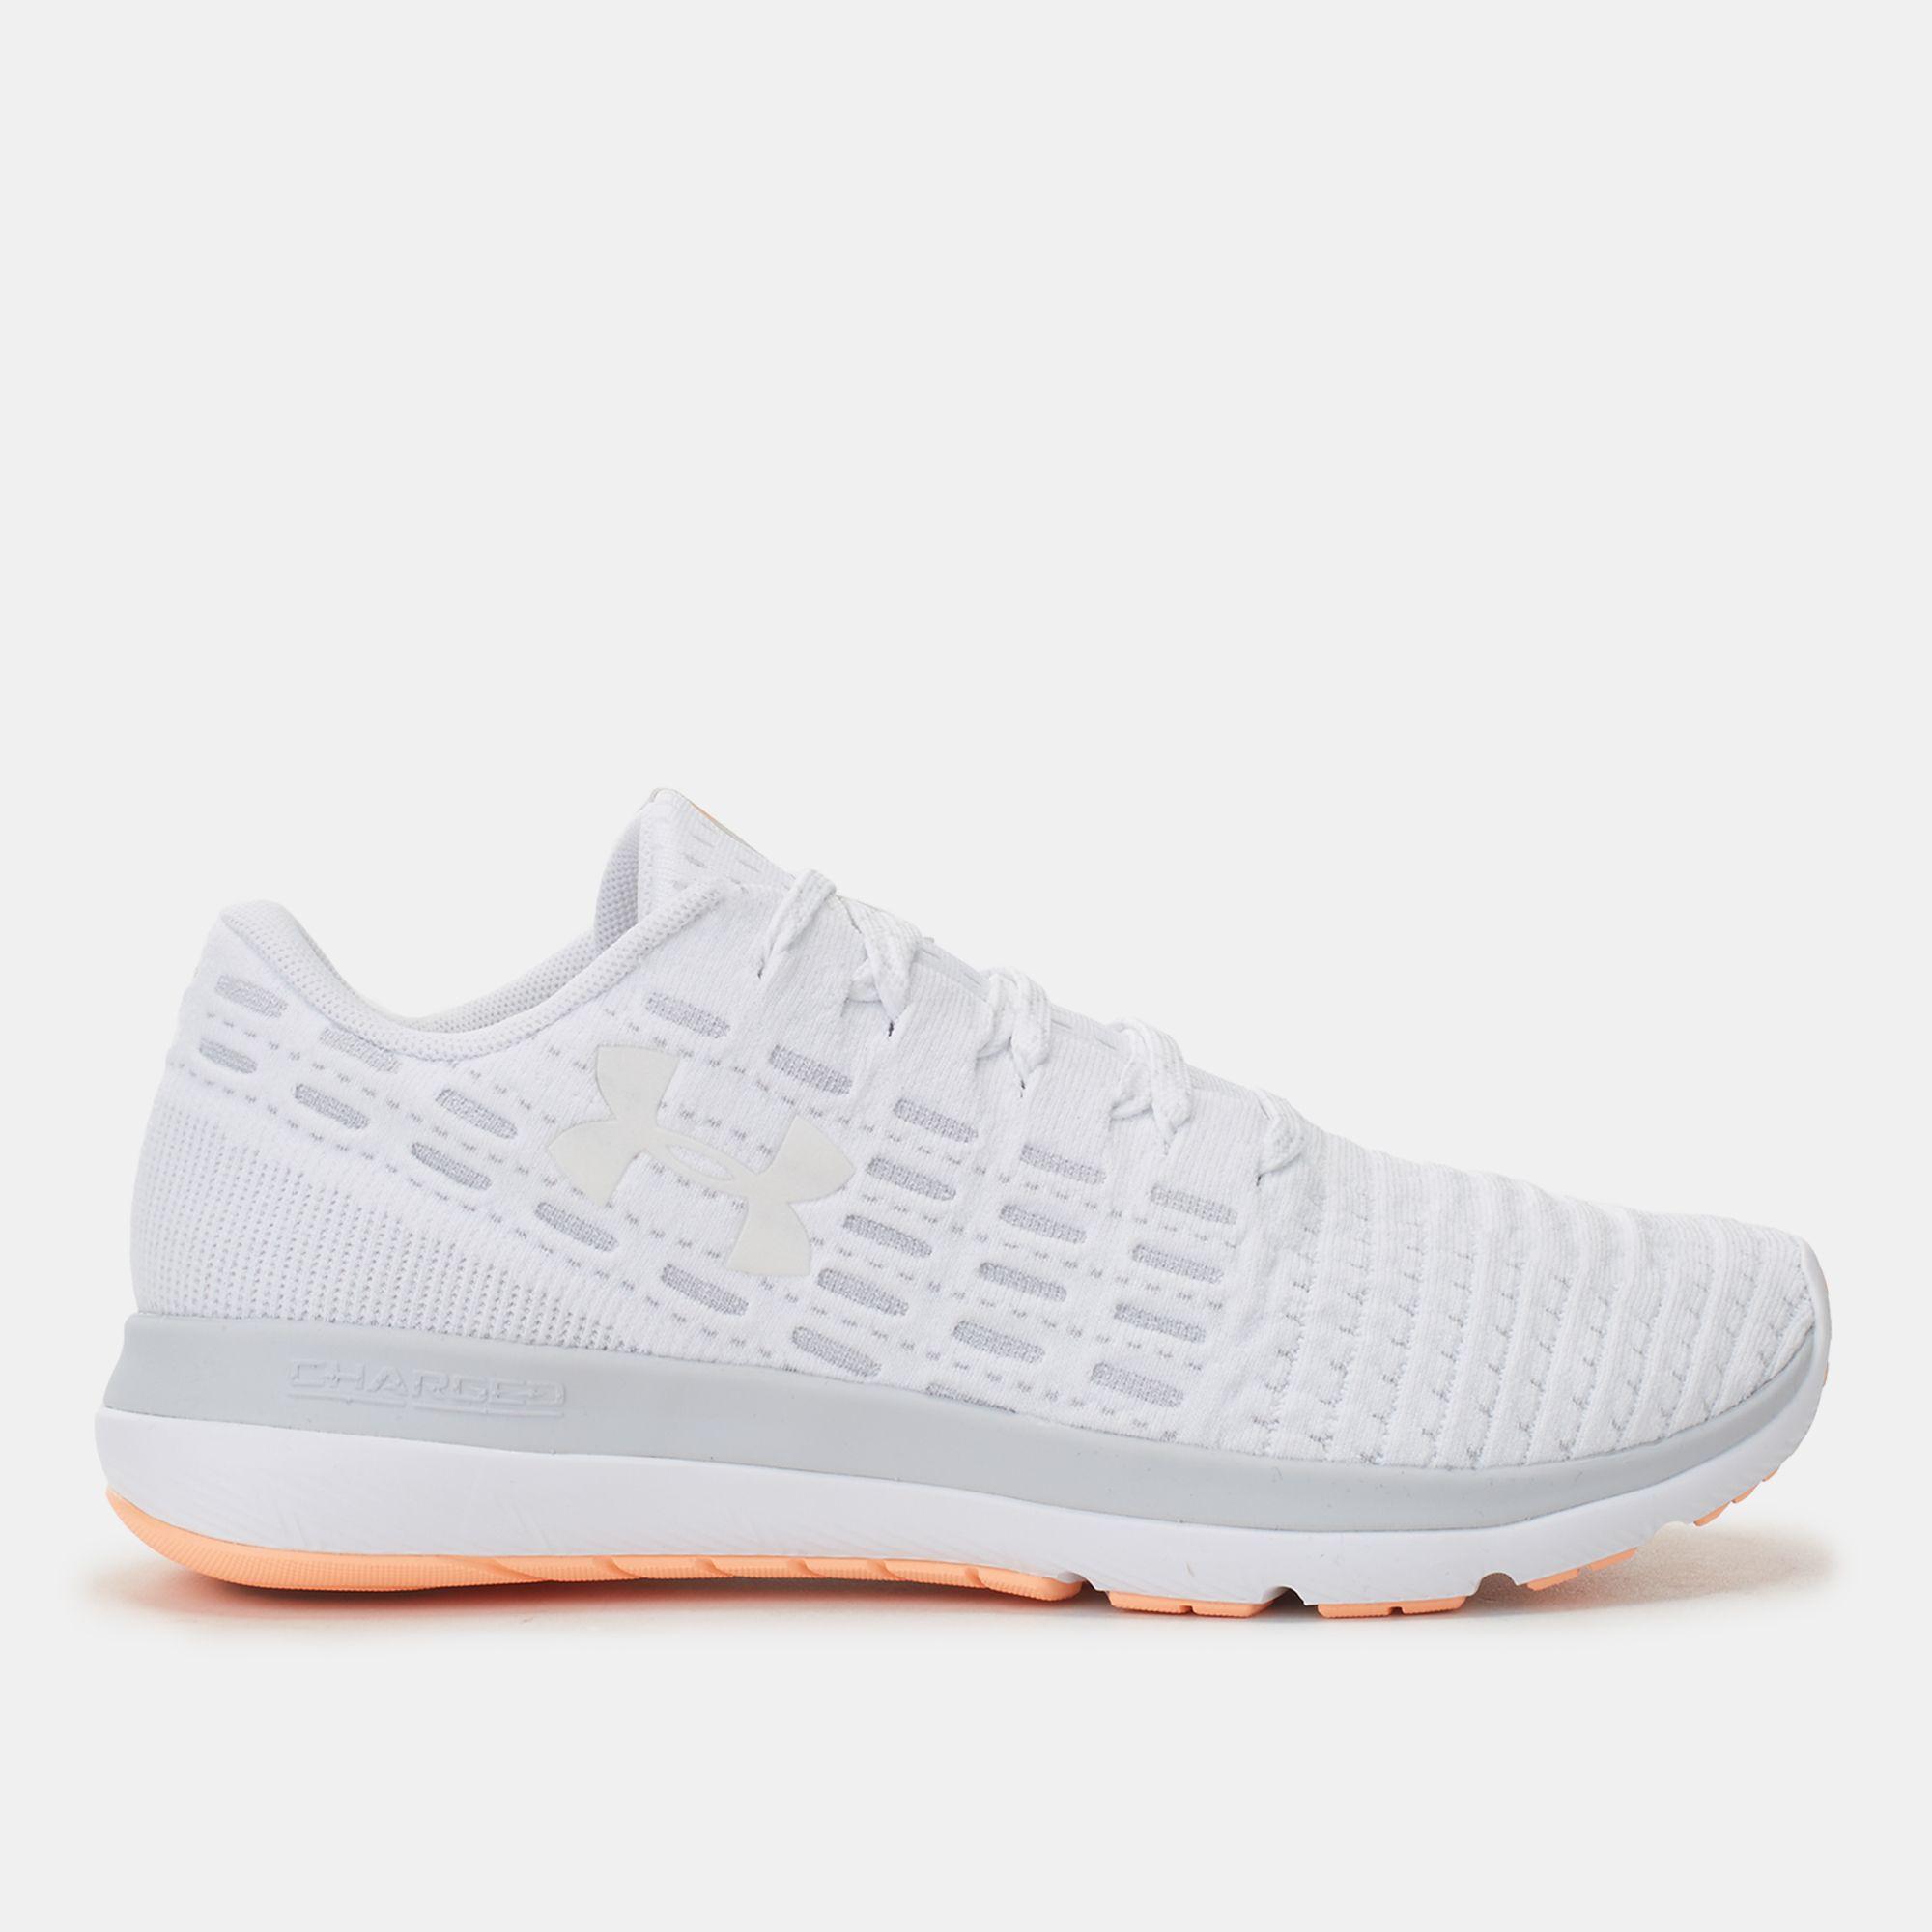 buy online 3e909 81444 Shop White Under Armour Threadborne Slingflex Shoe for ...